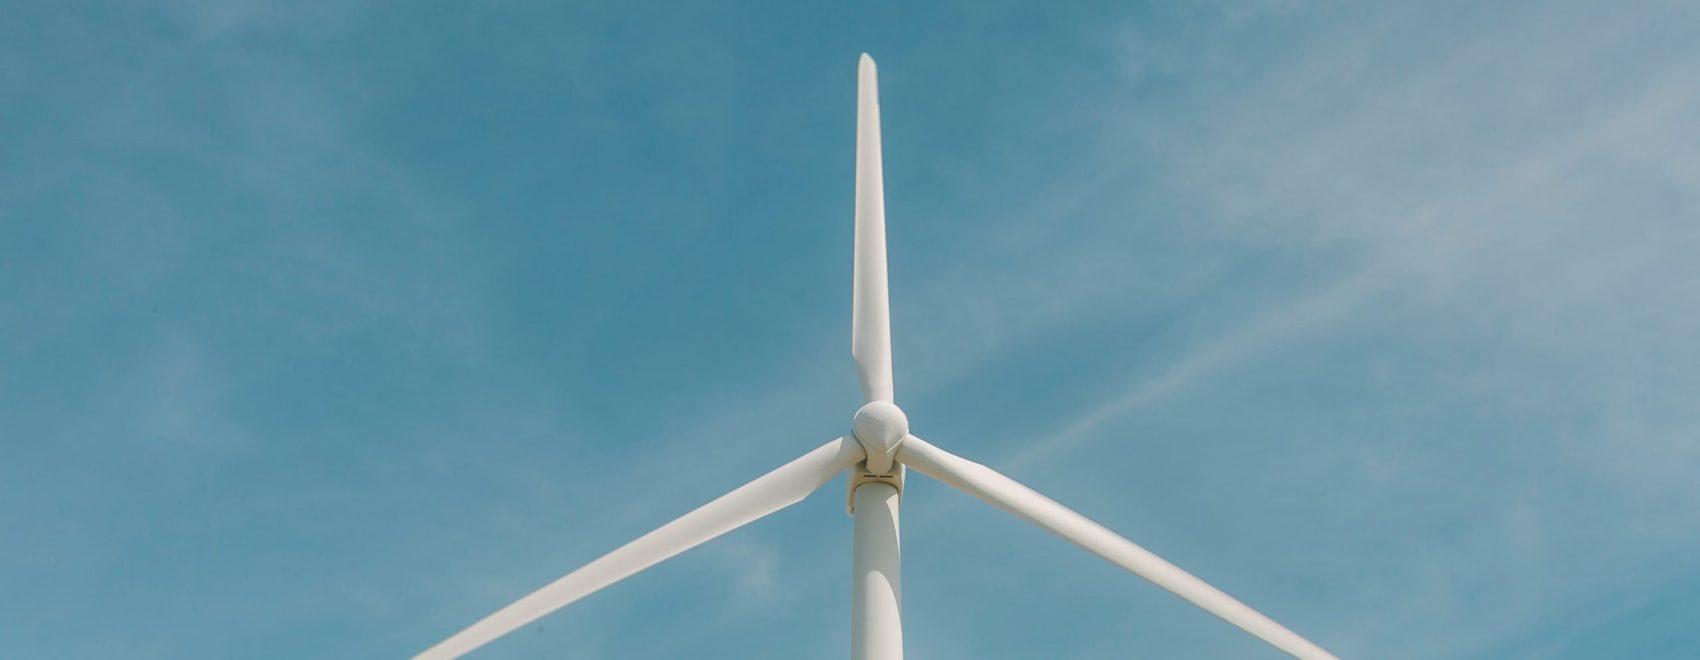 Image of single windfarm against blue sky